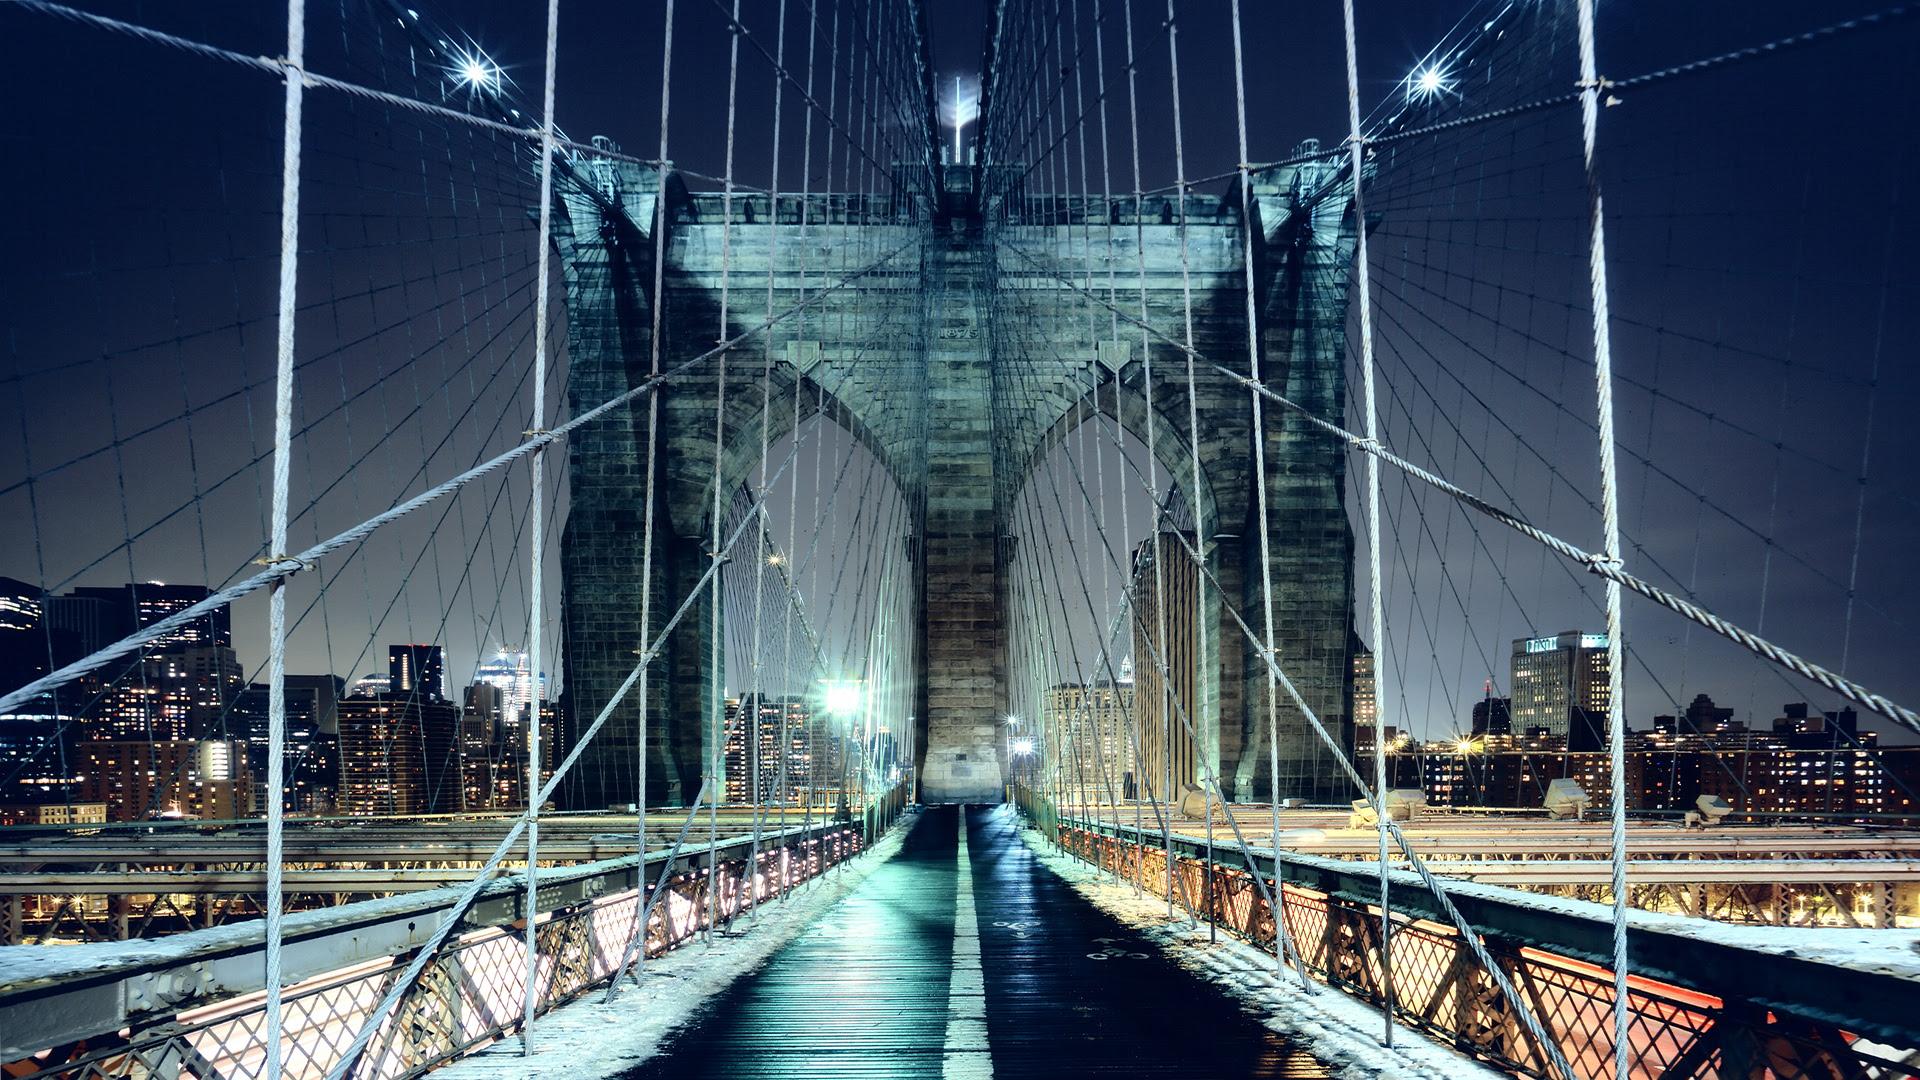 Brooklyn Bridge Walkway, New York City [1920x1080]